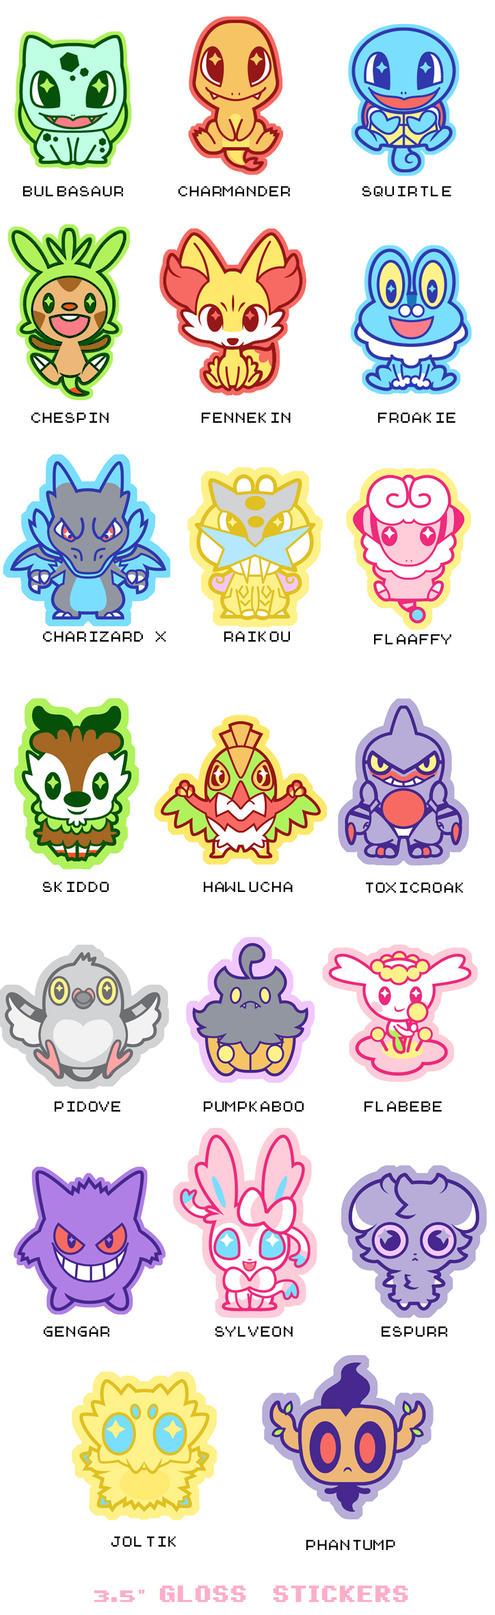 Pokemon stickers series 1 by DisfiguredStick